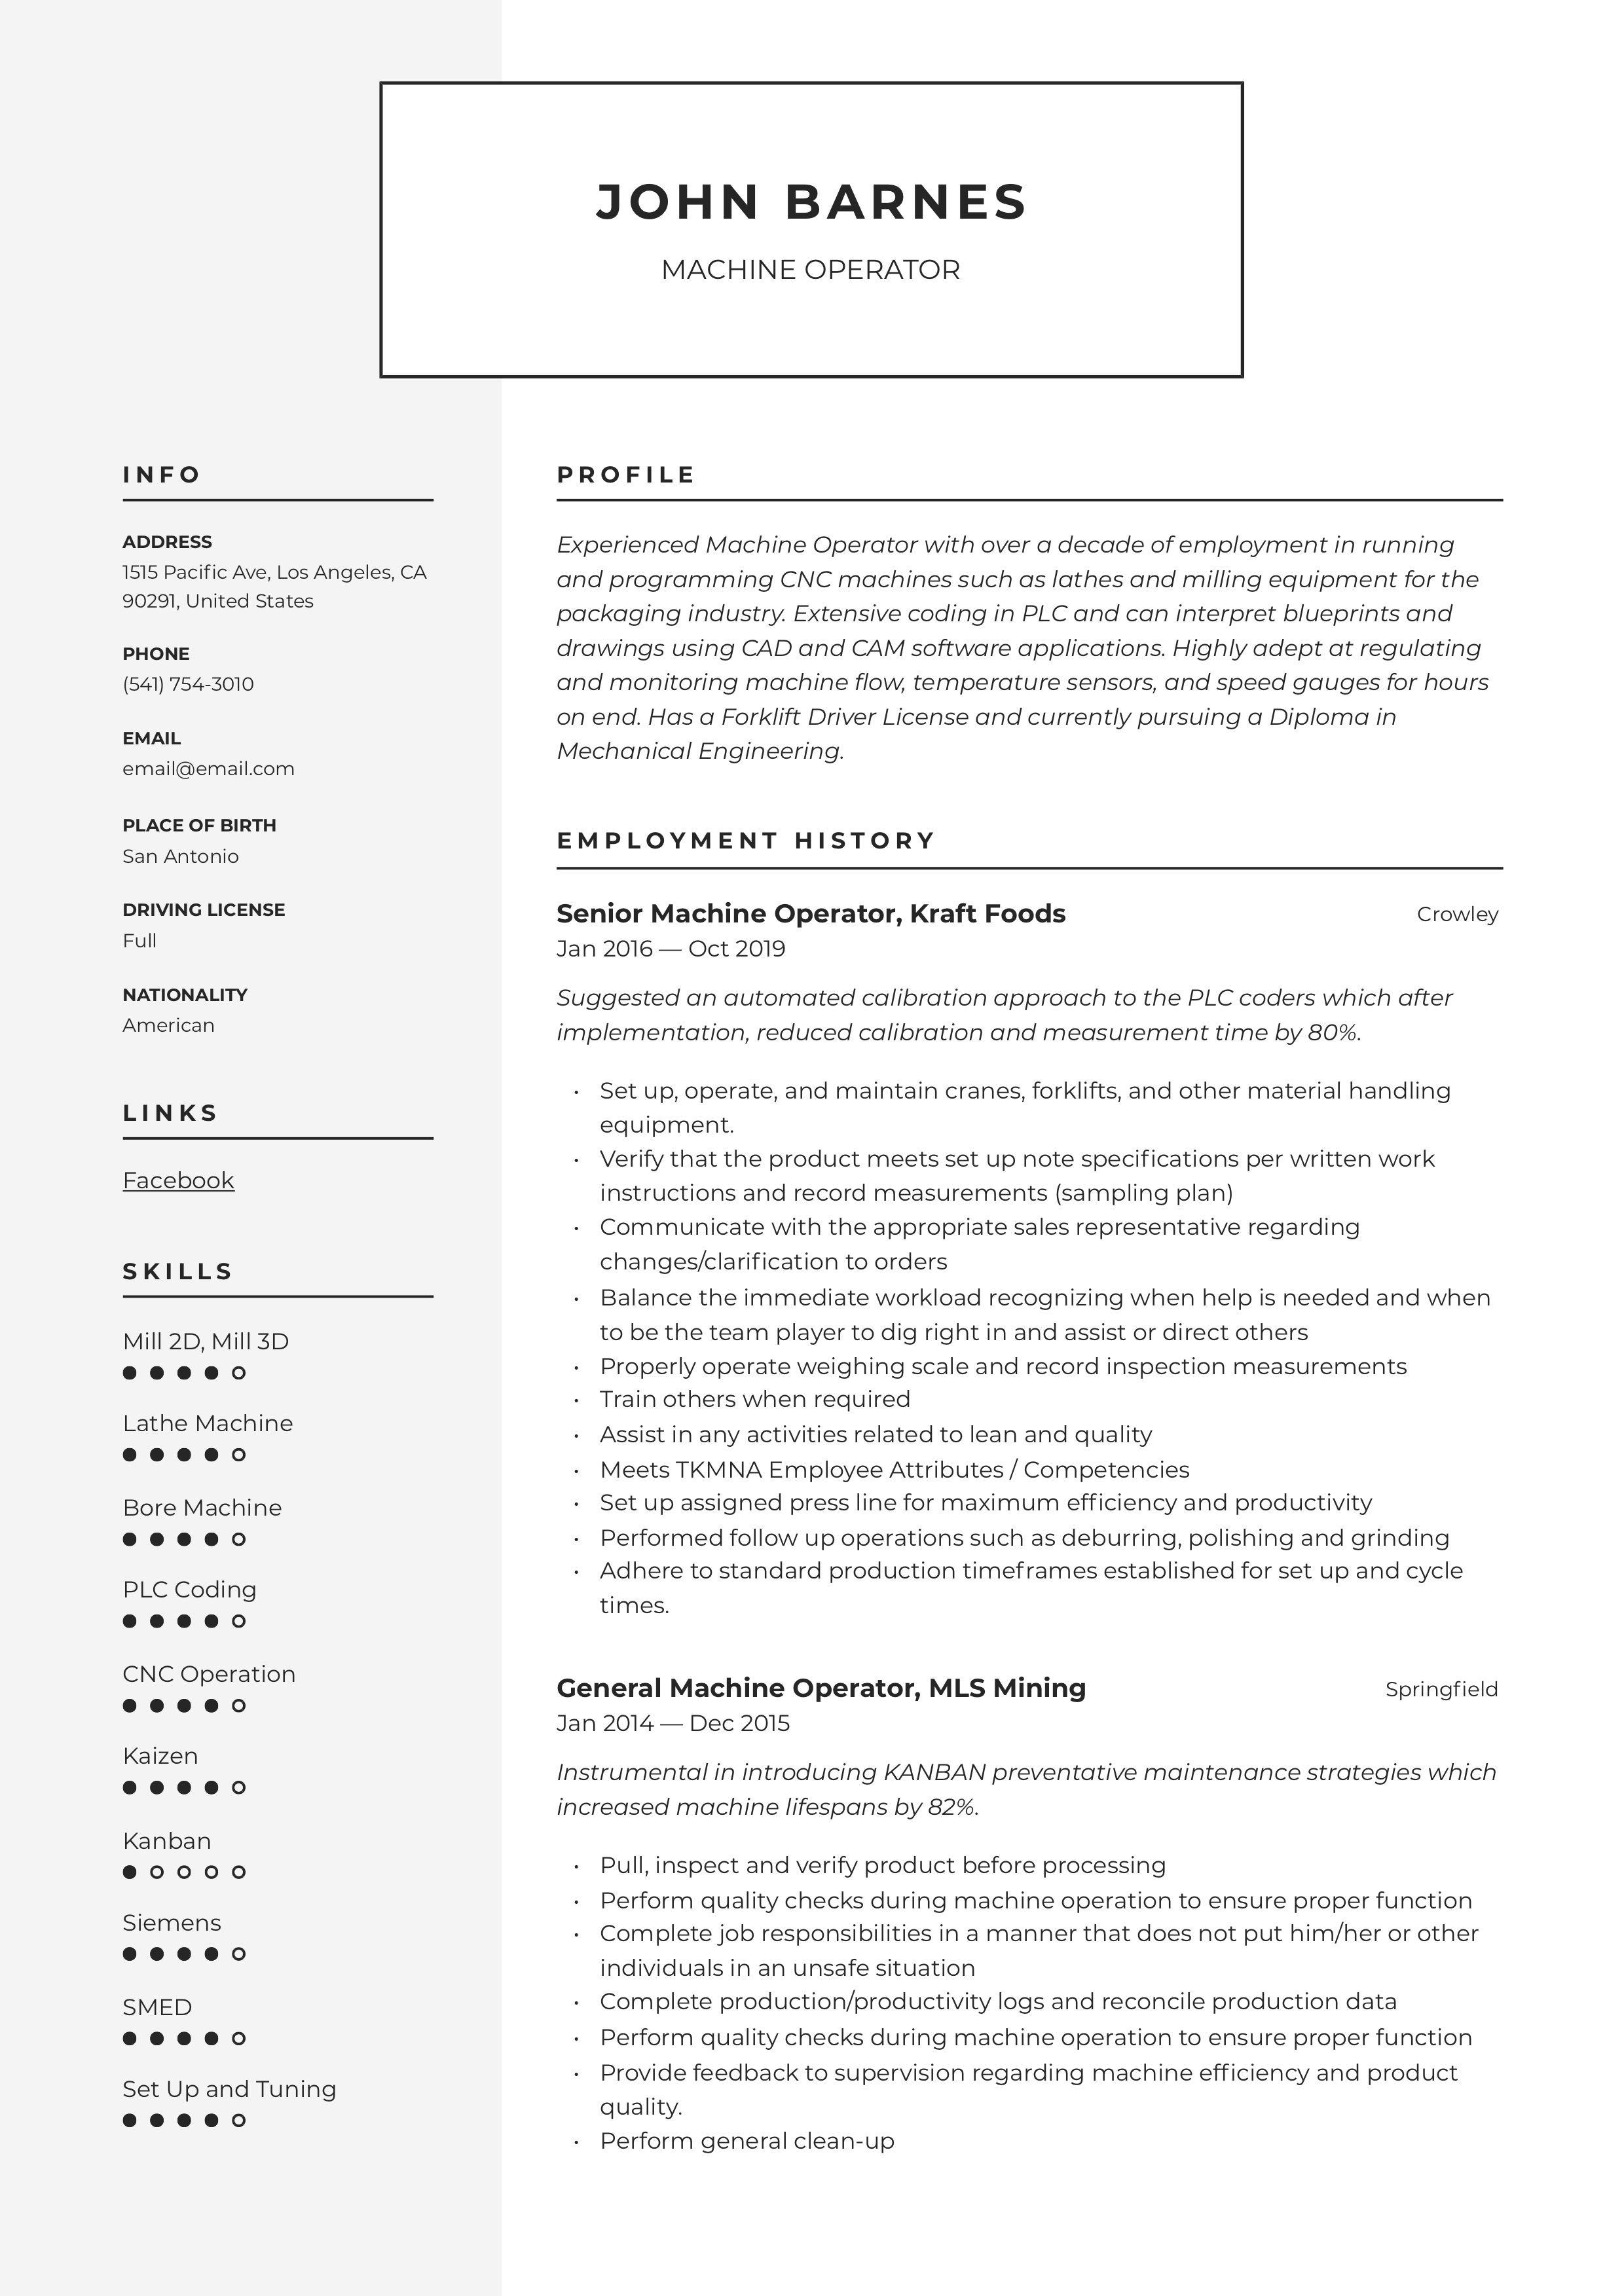 Machine Operator Resume & Writing Guide in 2020 Resume